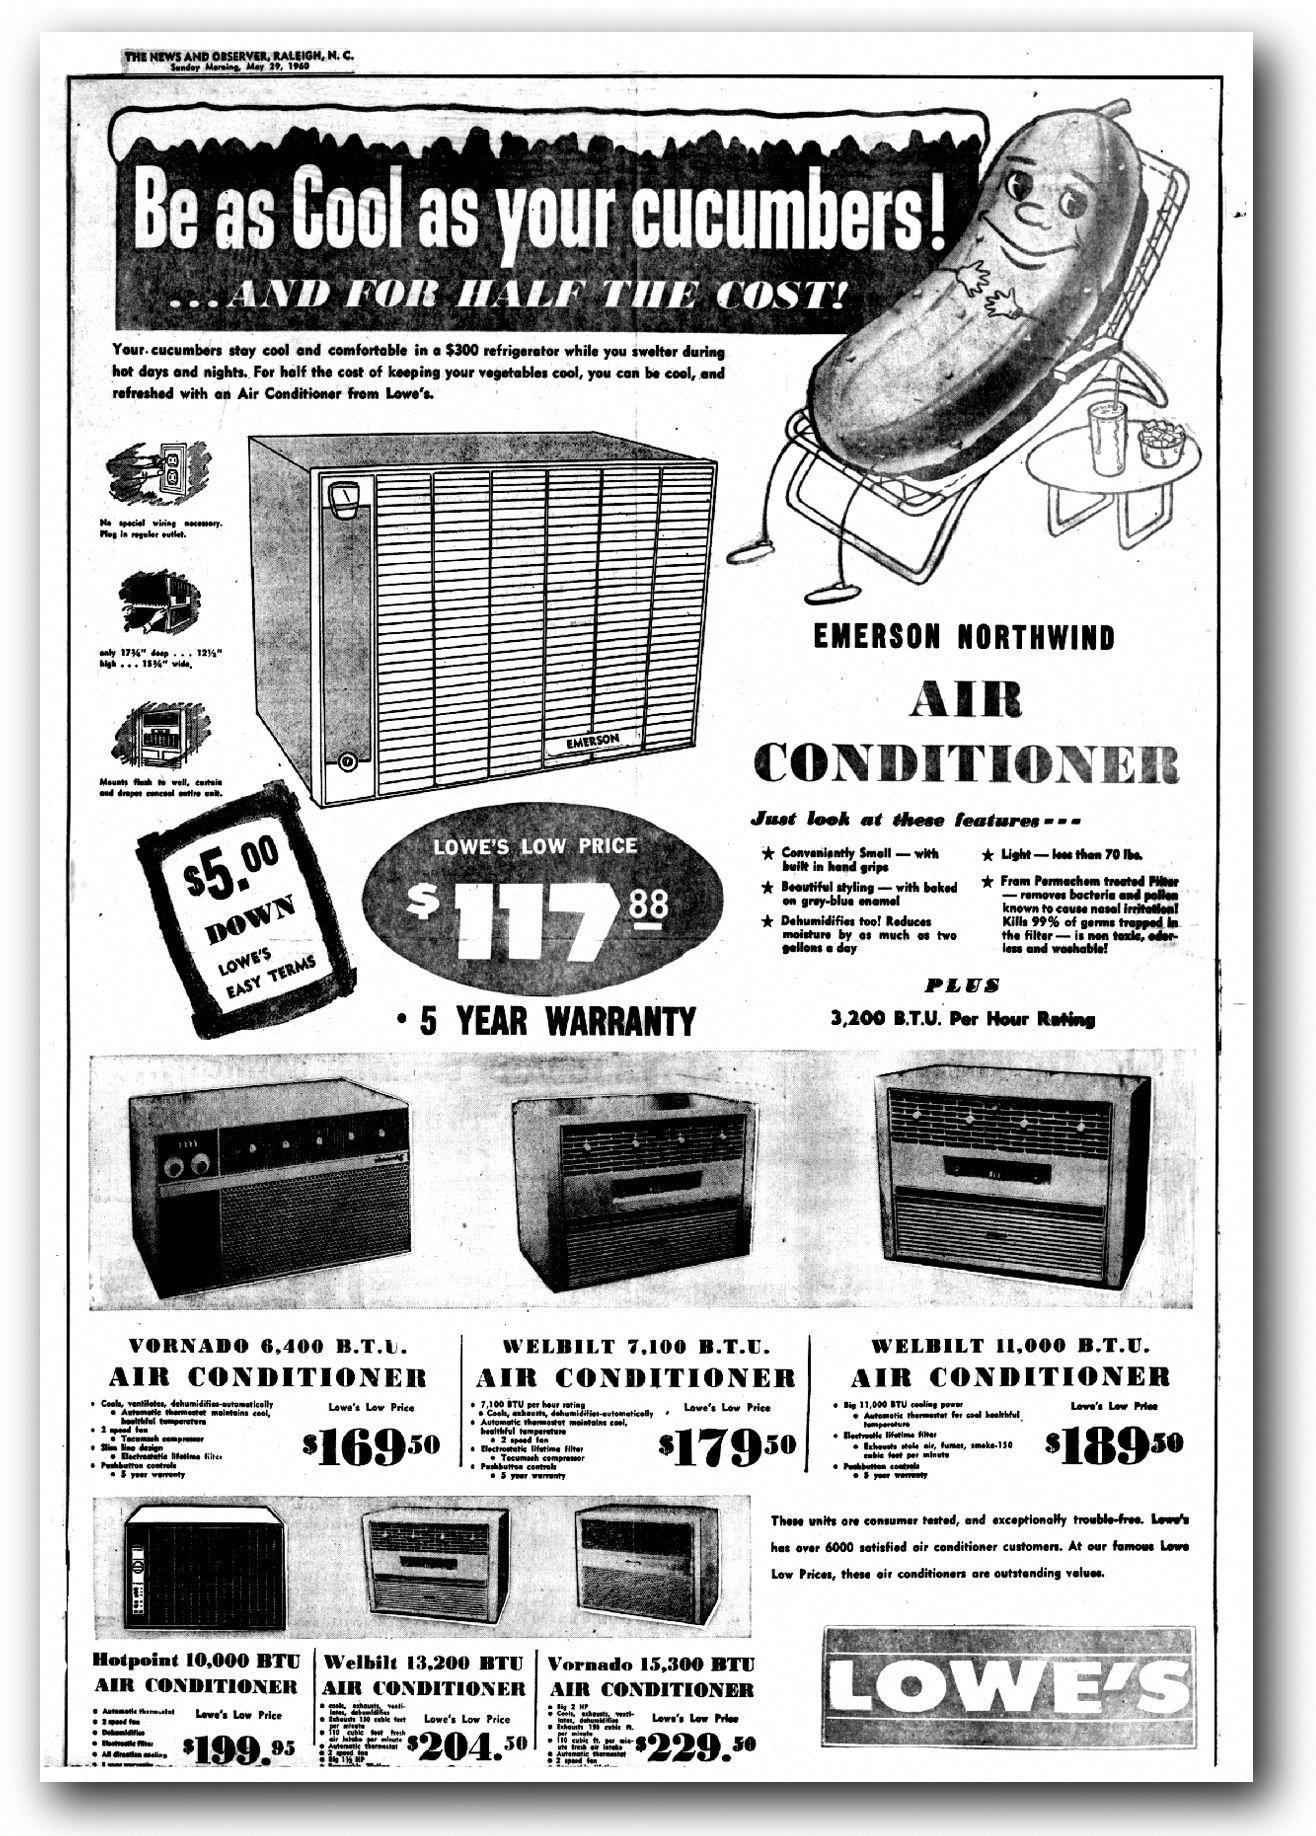 Kmart Home Appliances ID1874777134